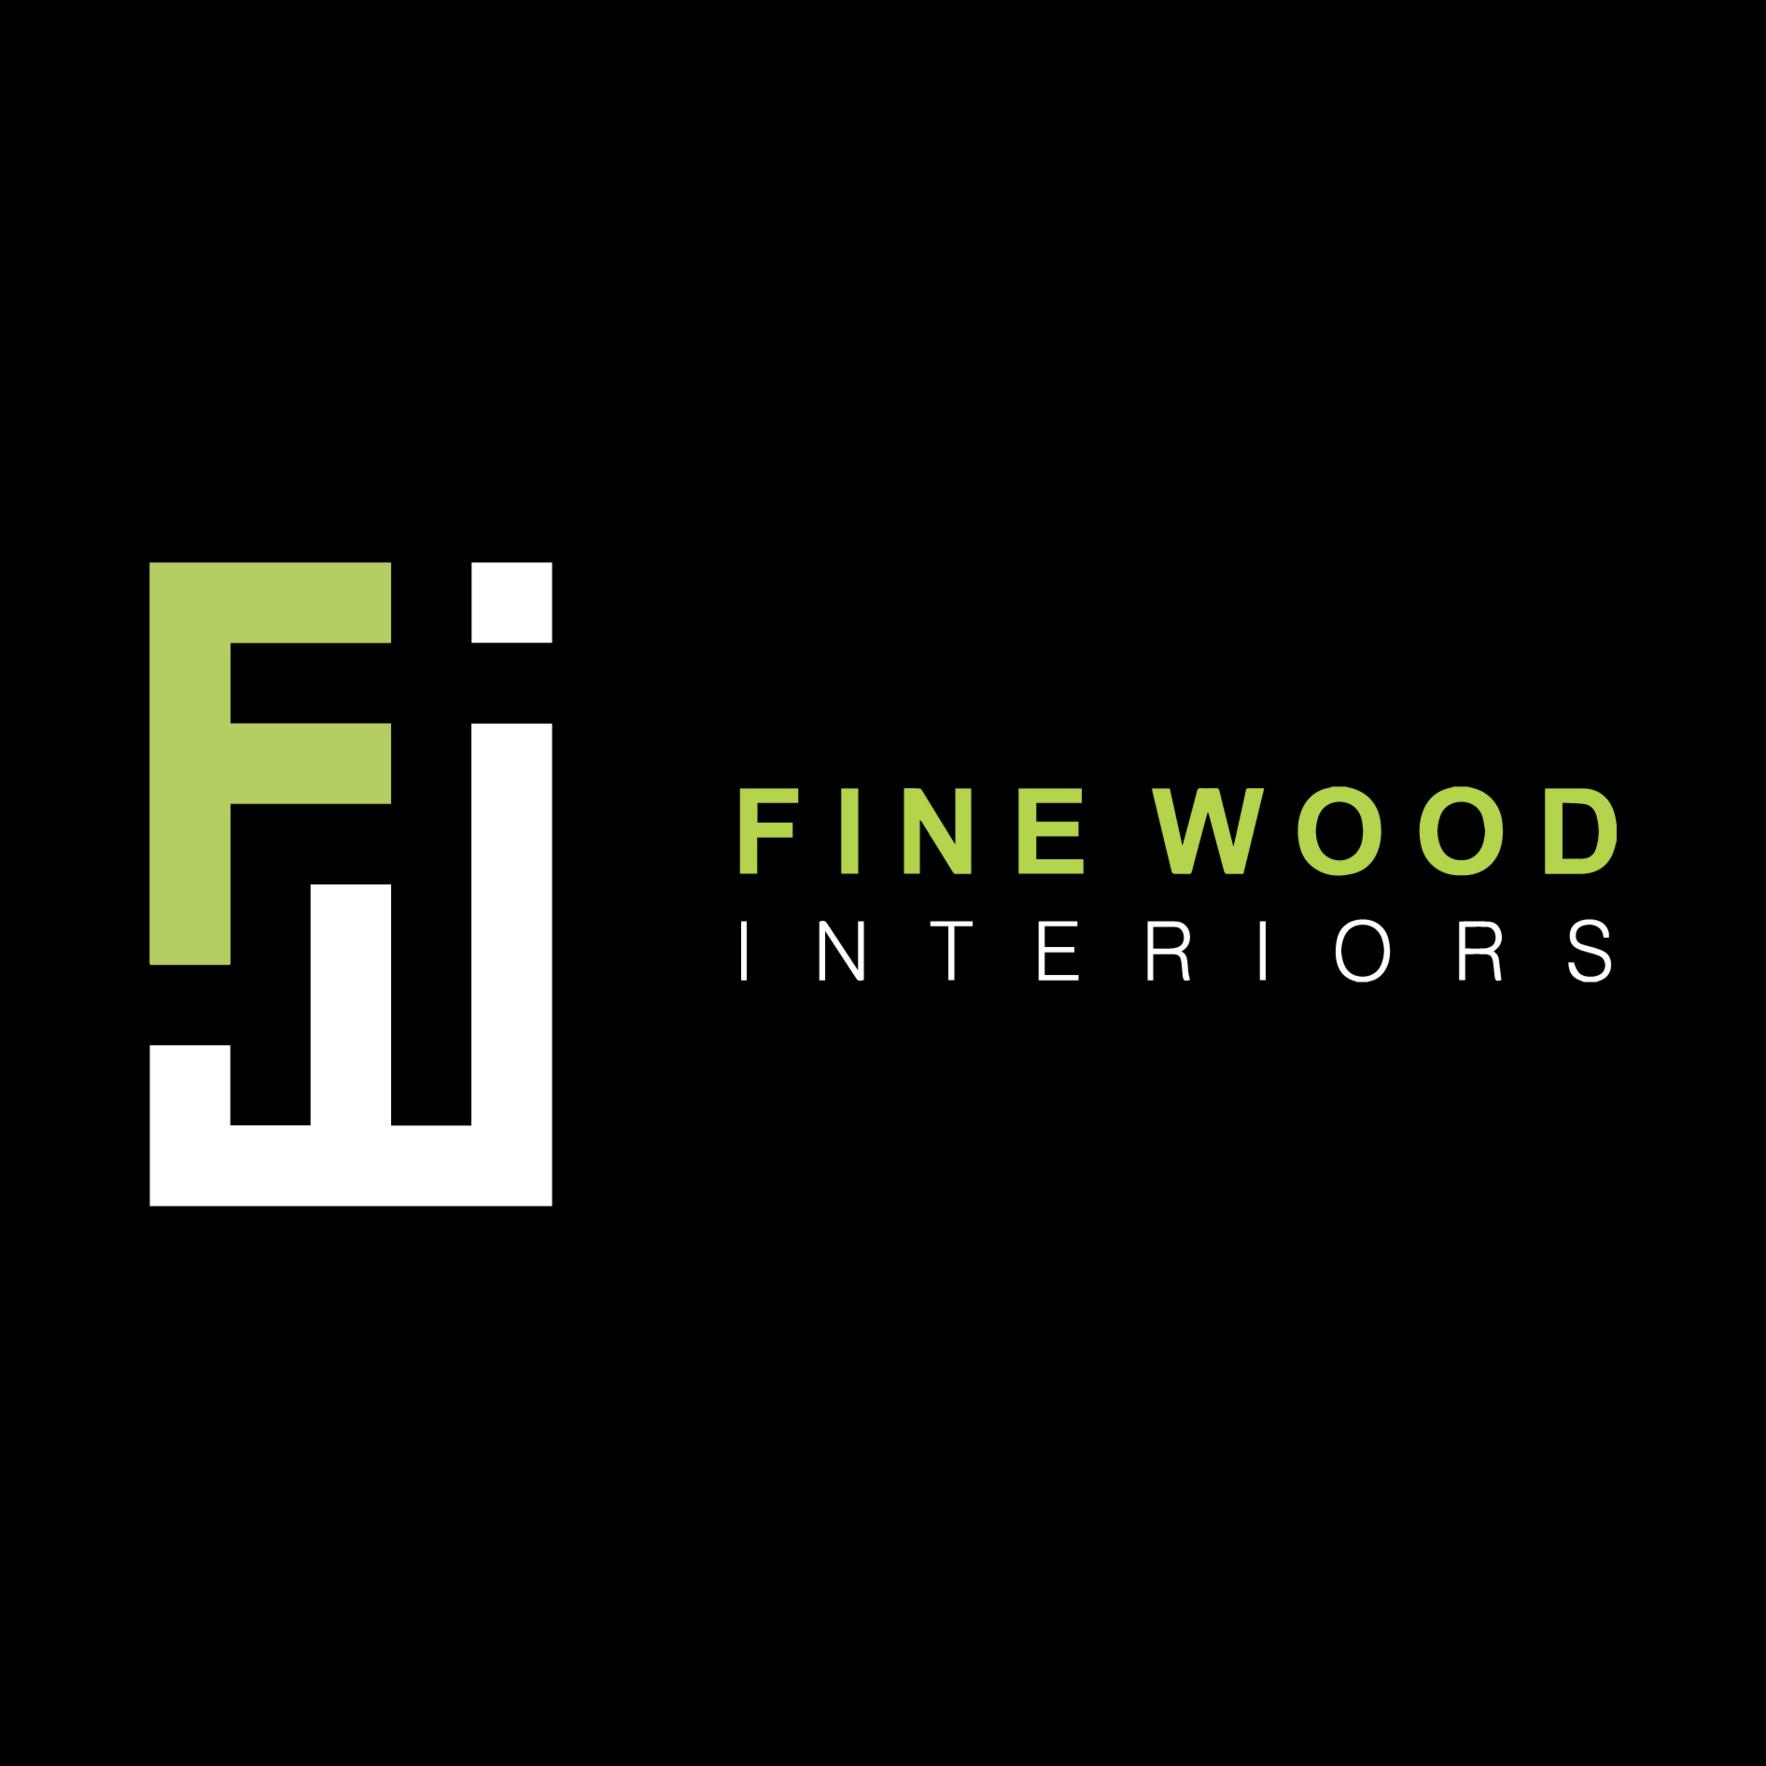 Fine Wood Interiors